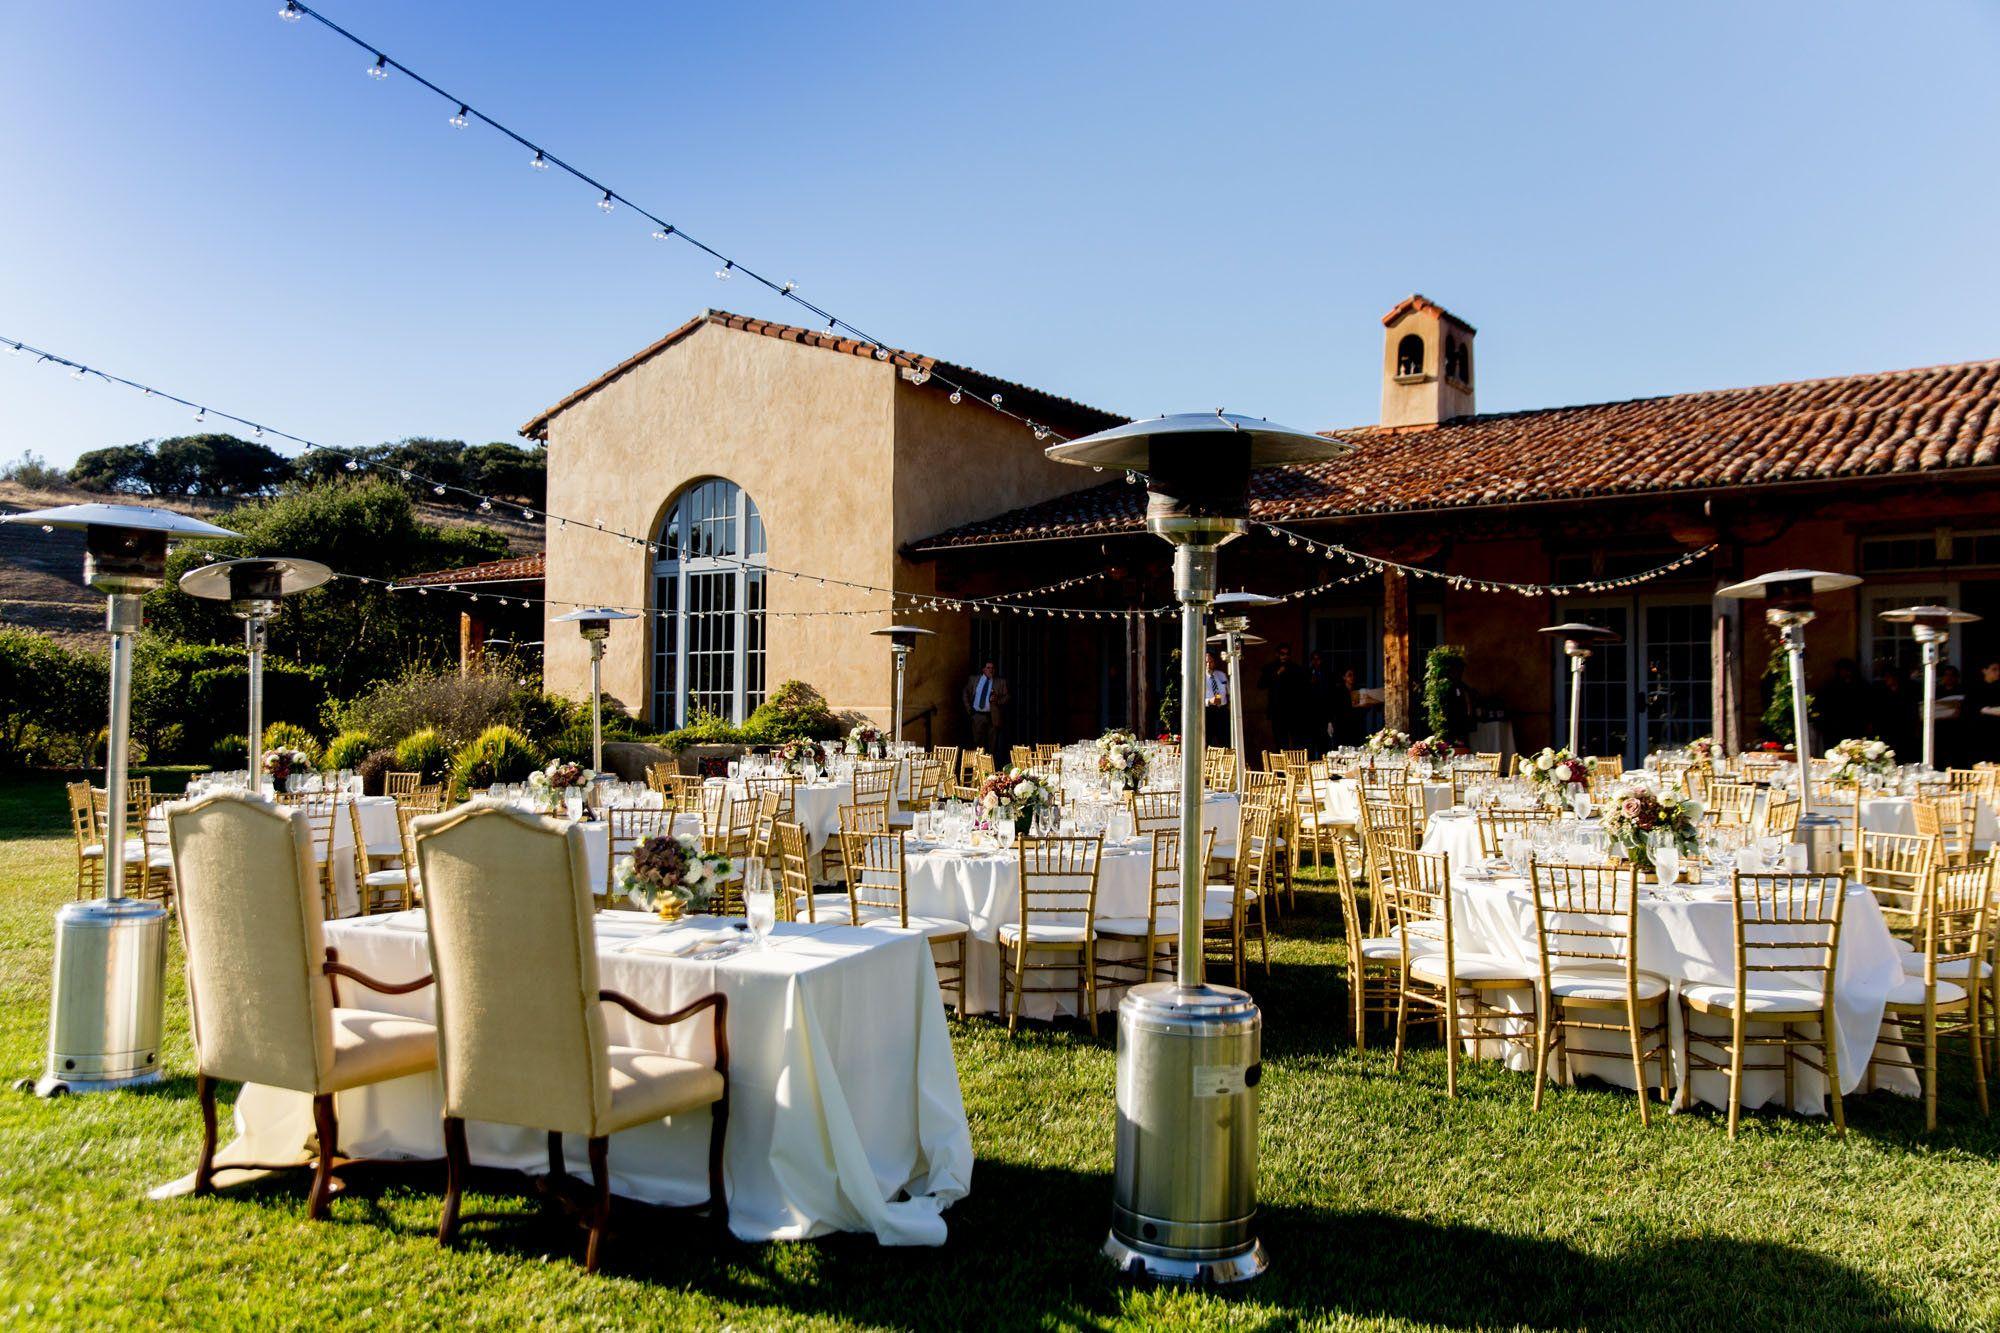 Wedding Reception At Nicklaus Club Monterey Ncmweddings Wedding Reception Reception Table Decorations